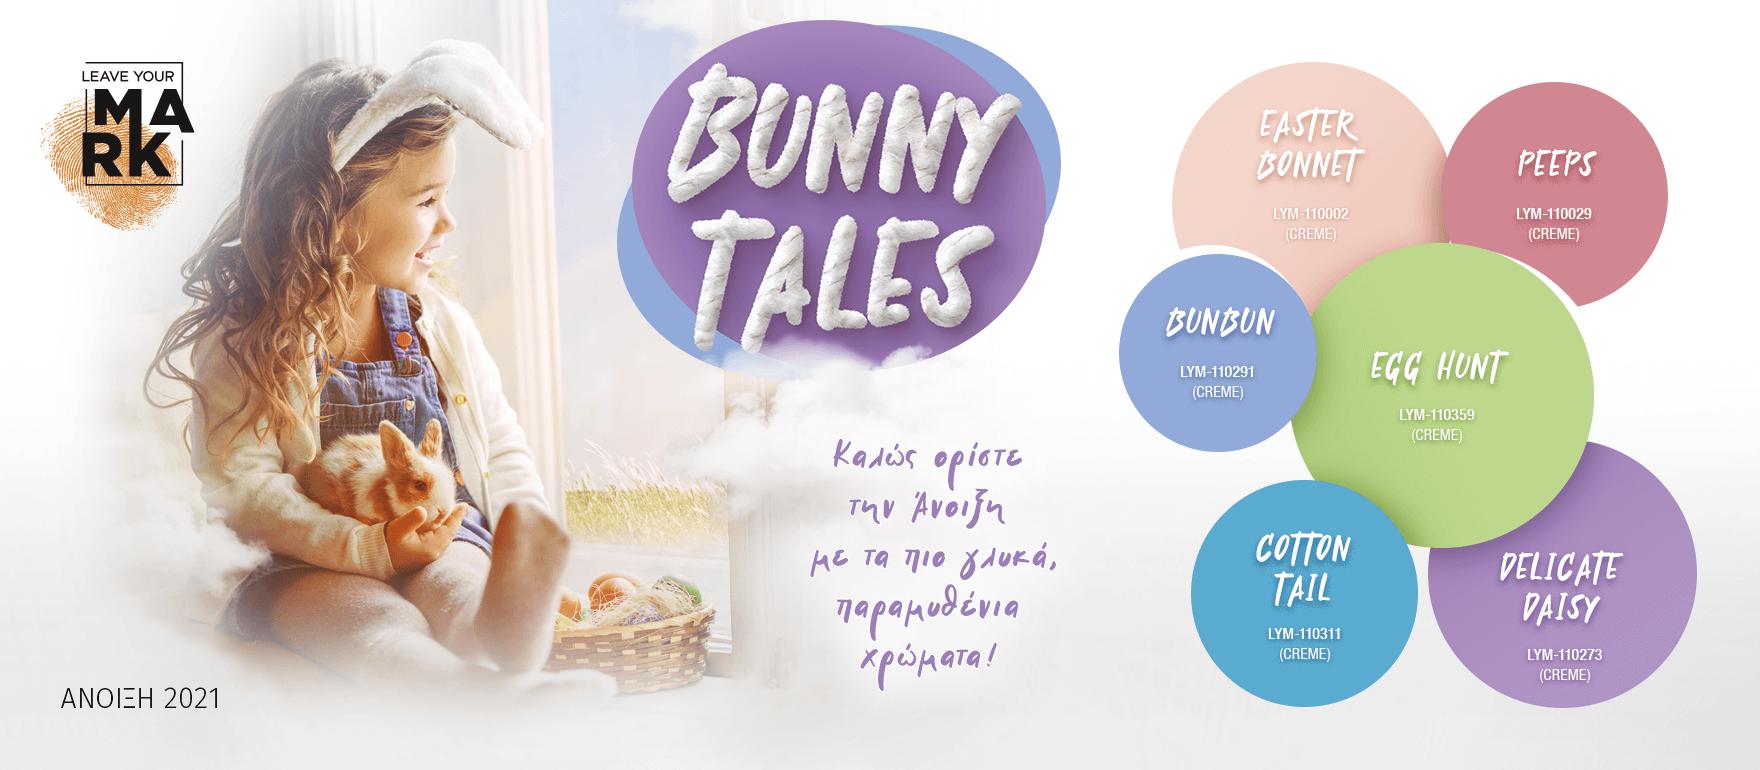 LYM - Spring 2021 - Bunny Tales